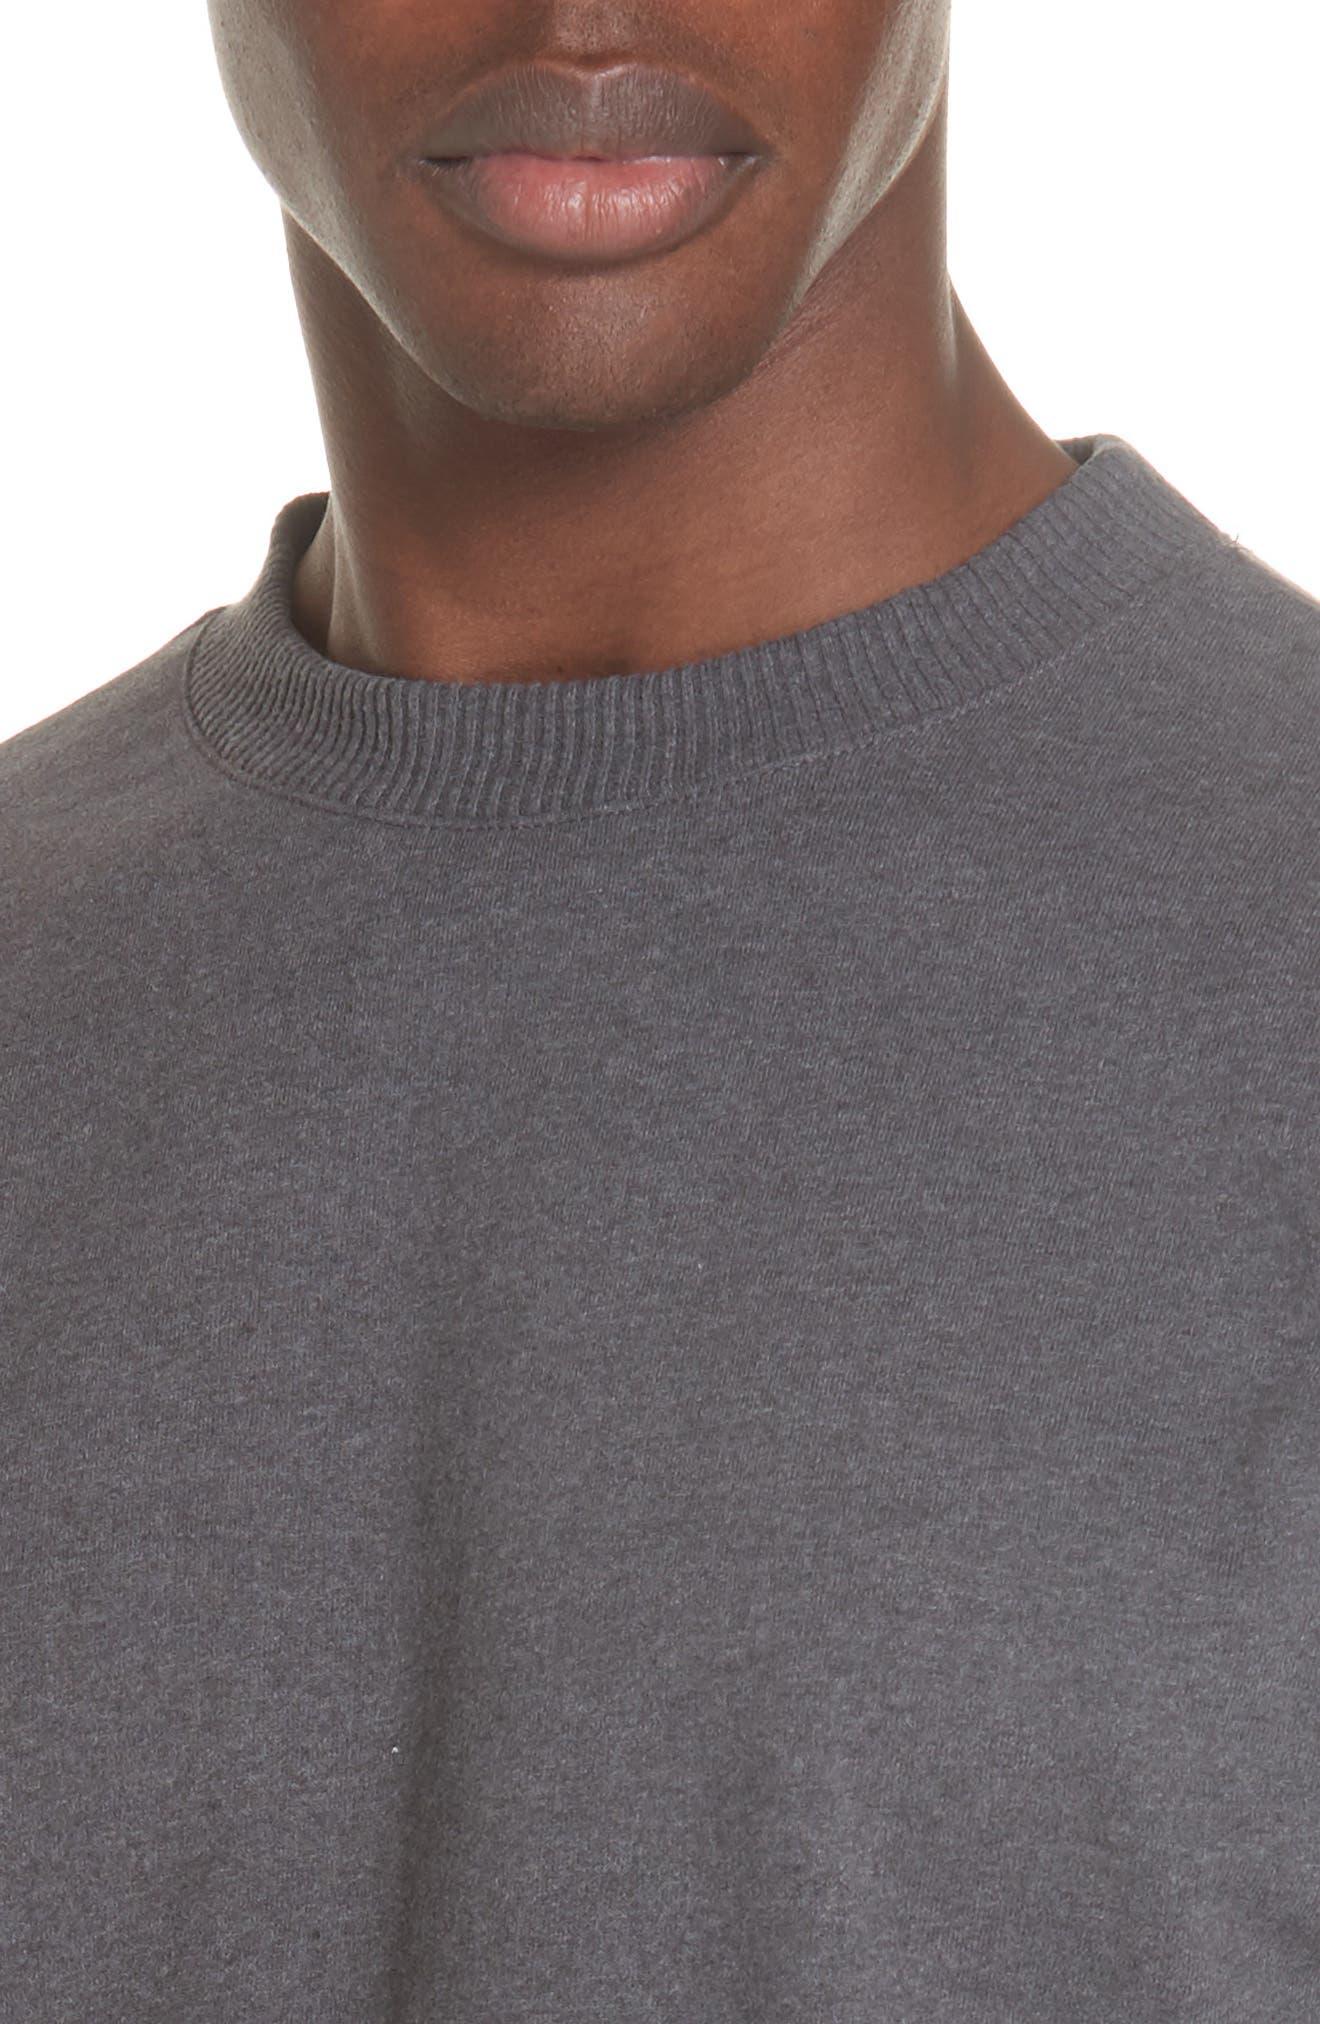 Roman Crewneck Sweatshirt,                             Alternate thumbnail 4, color,                             ANTHRACITE LAD